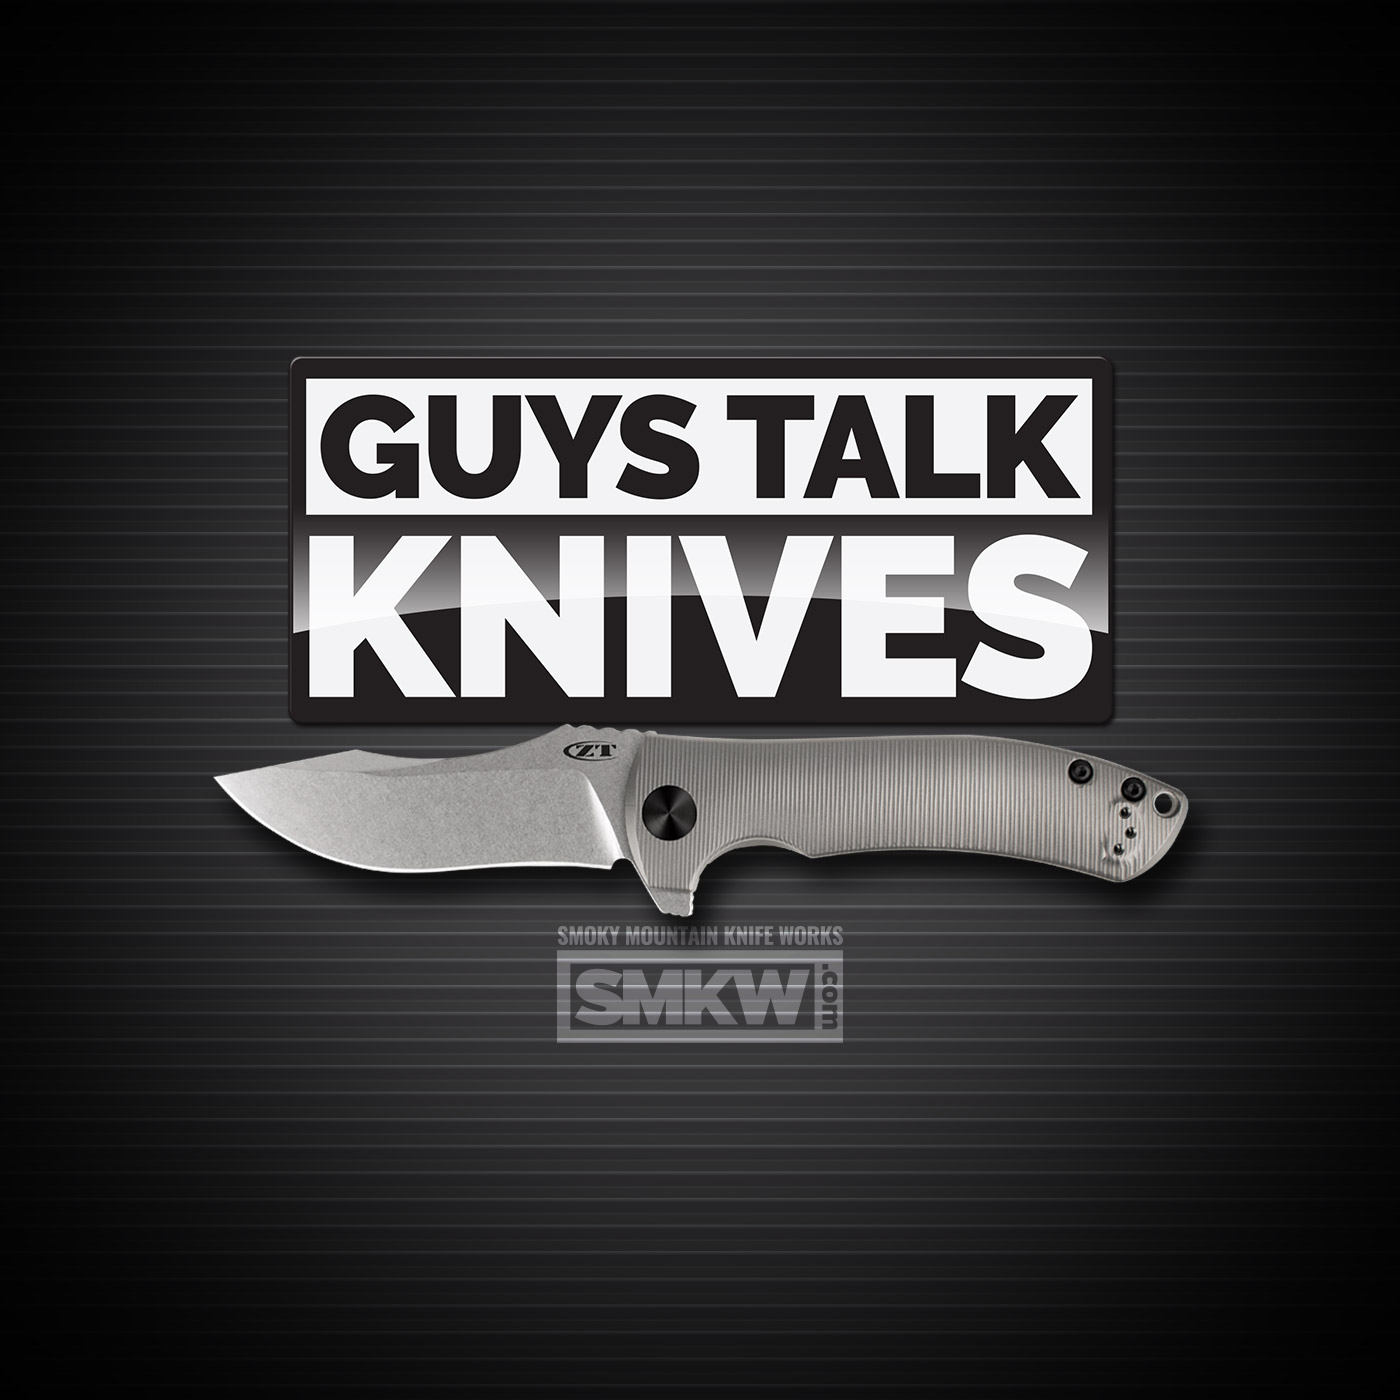 Guys Talk Knives: Guys Talk Knives: Best-selling Spyderco (Ep. 47)